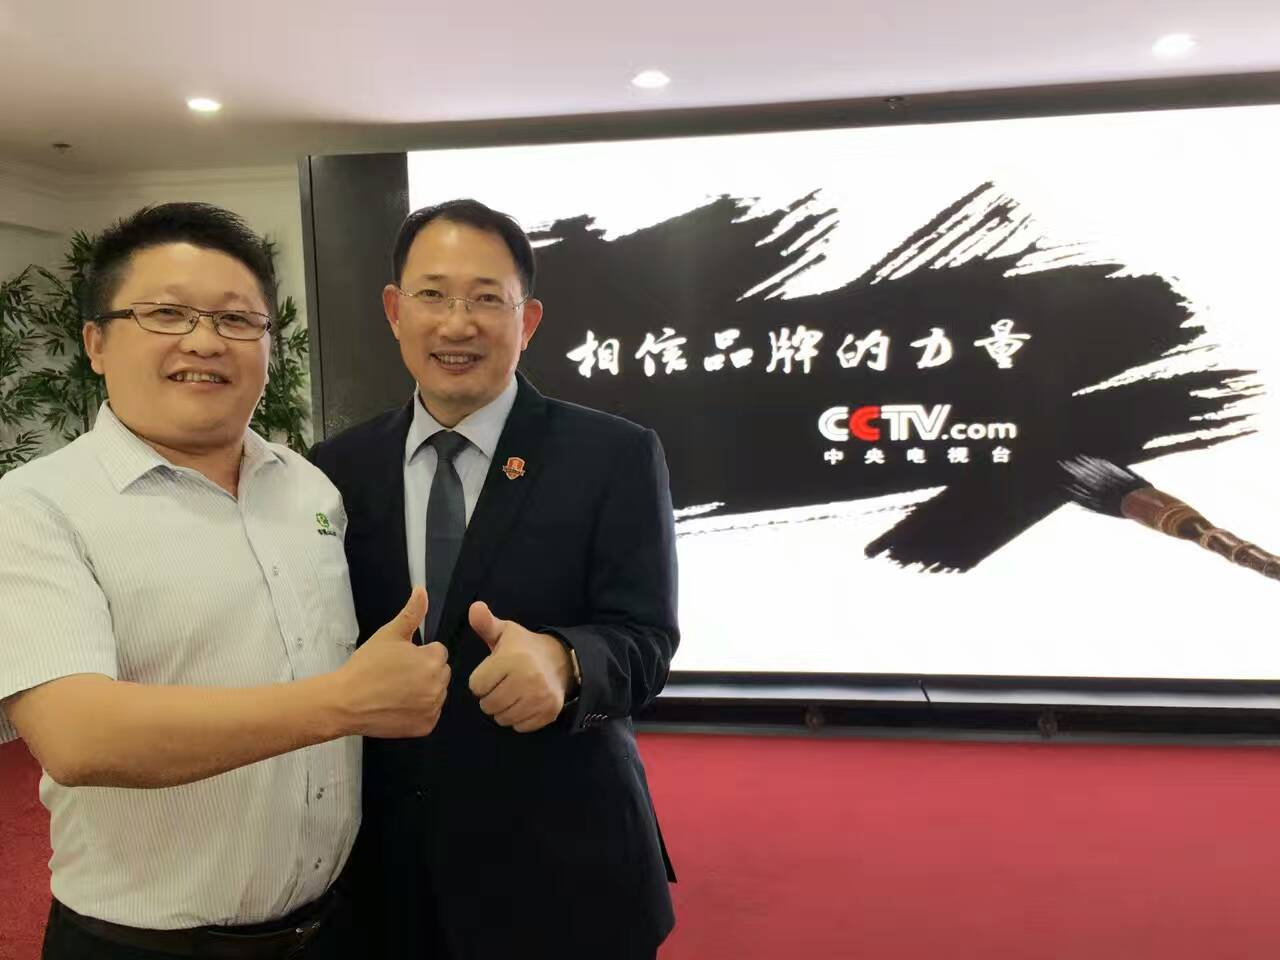 CCTV【牛商论道】栏目开机仪式,漆强化工走进央视